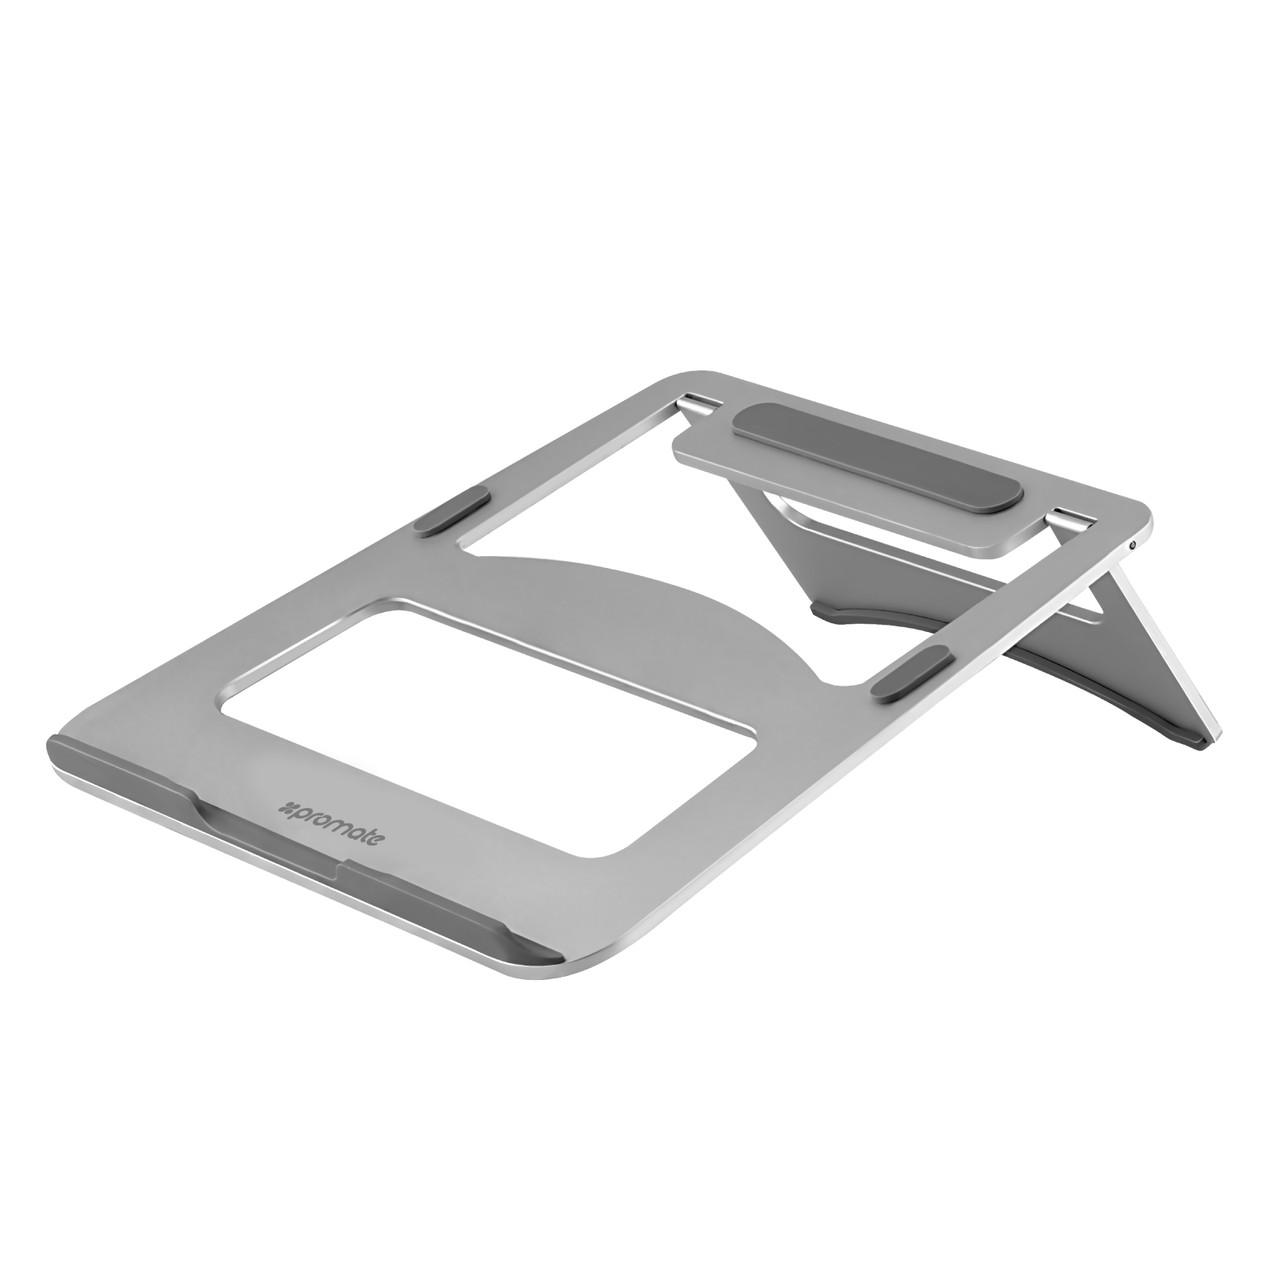 Подставка под ноутбук Promate Deskmate-3 Silver (Распакован)